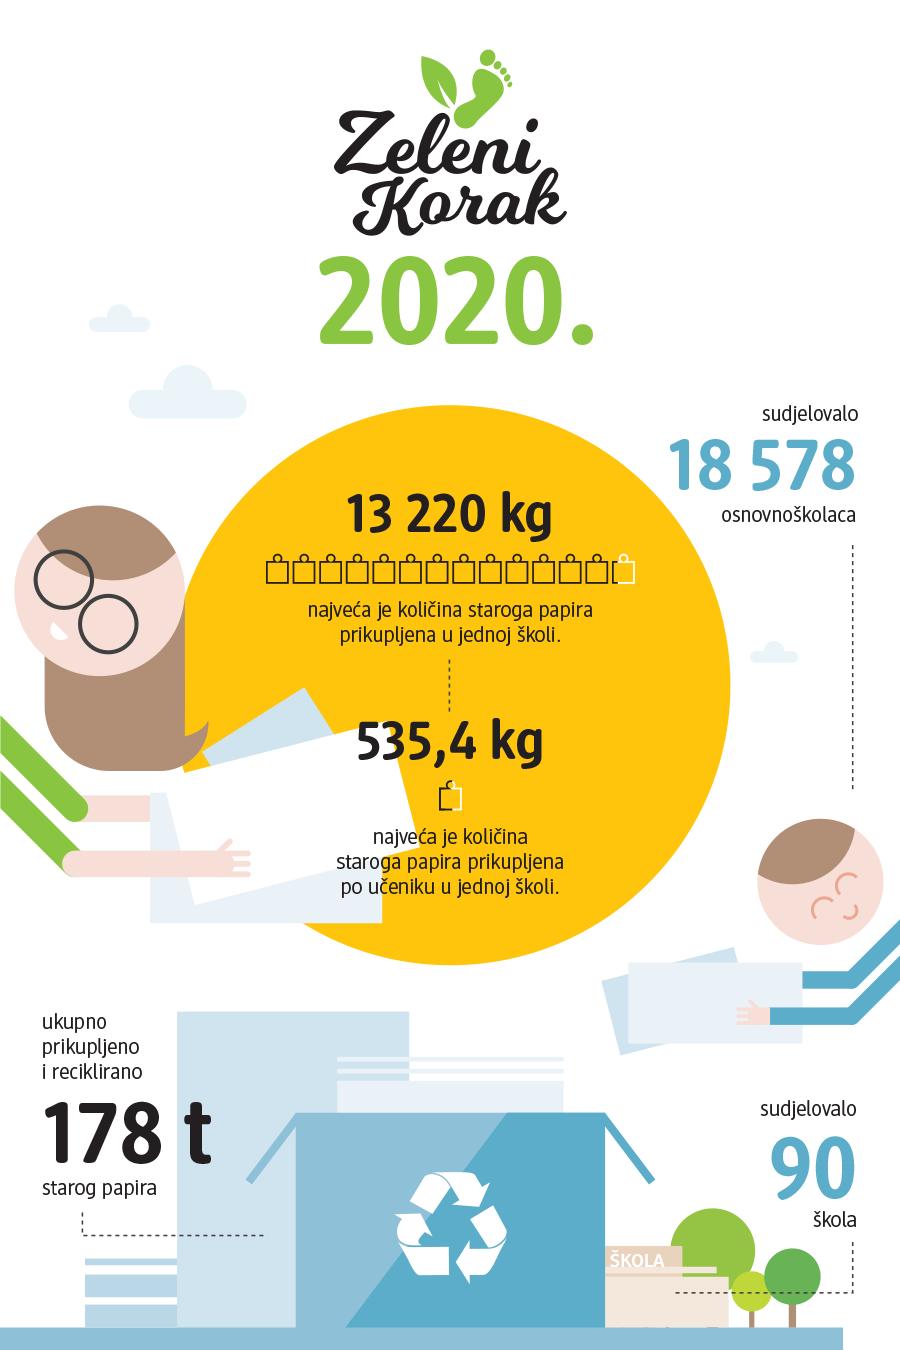 Zeleni Korak 2020